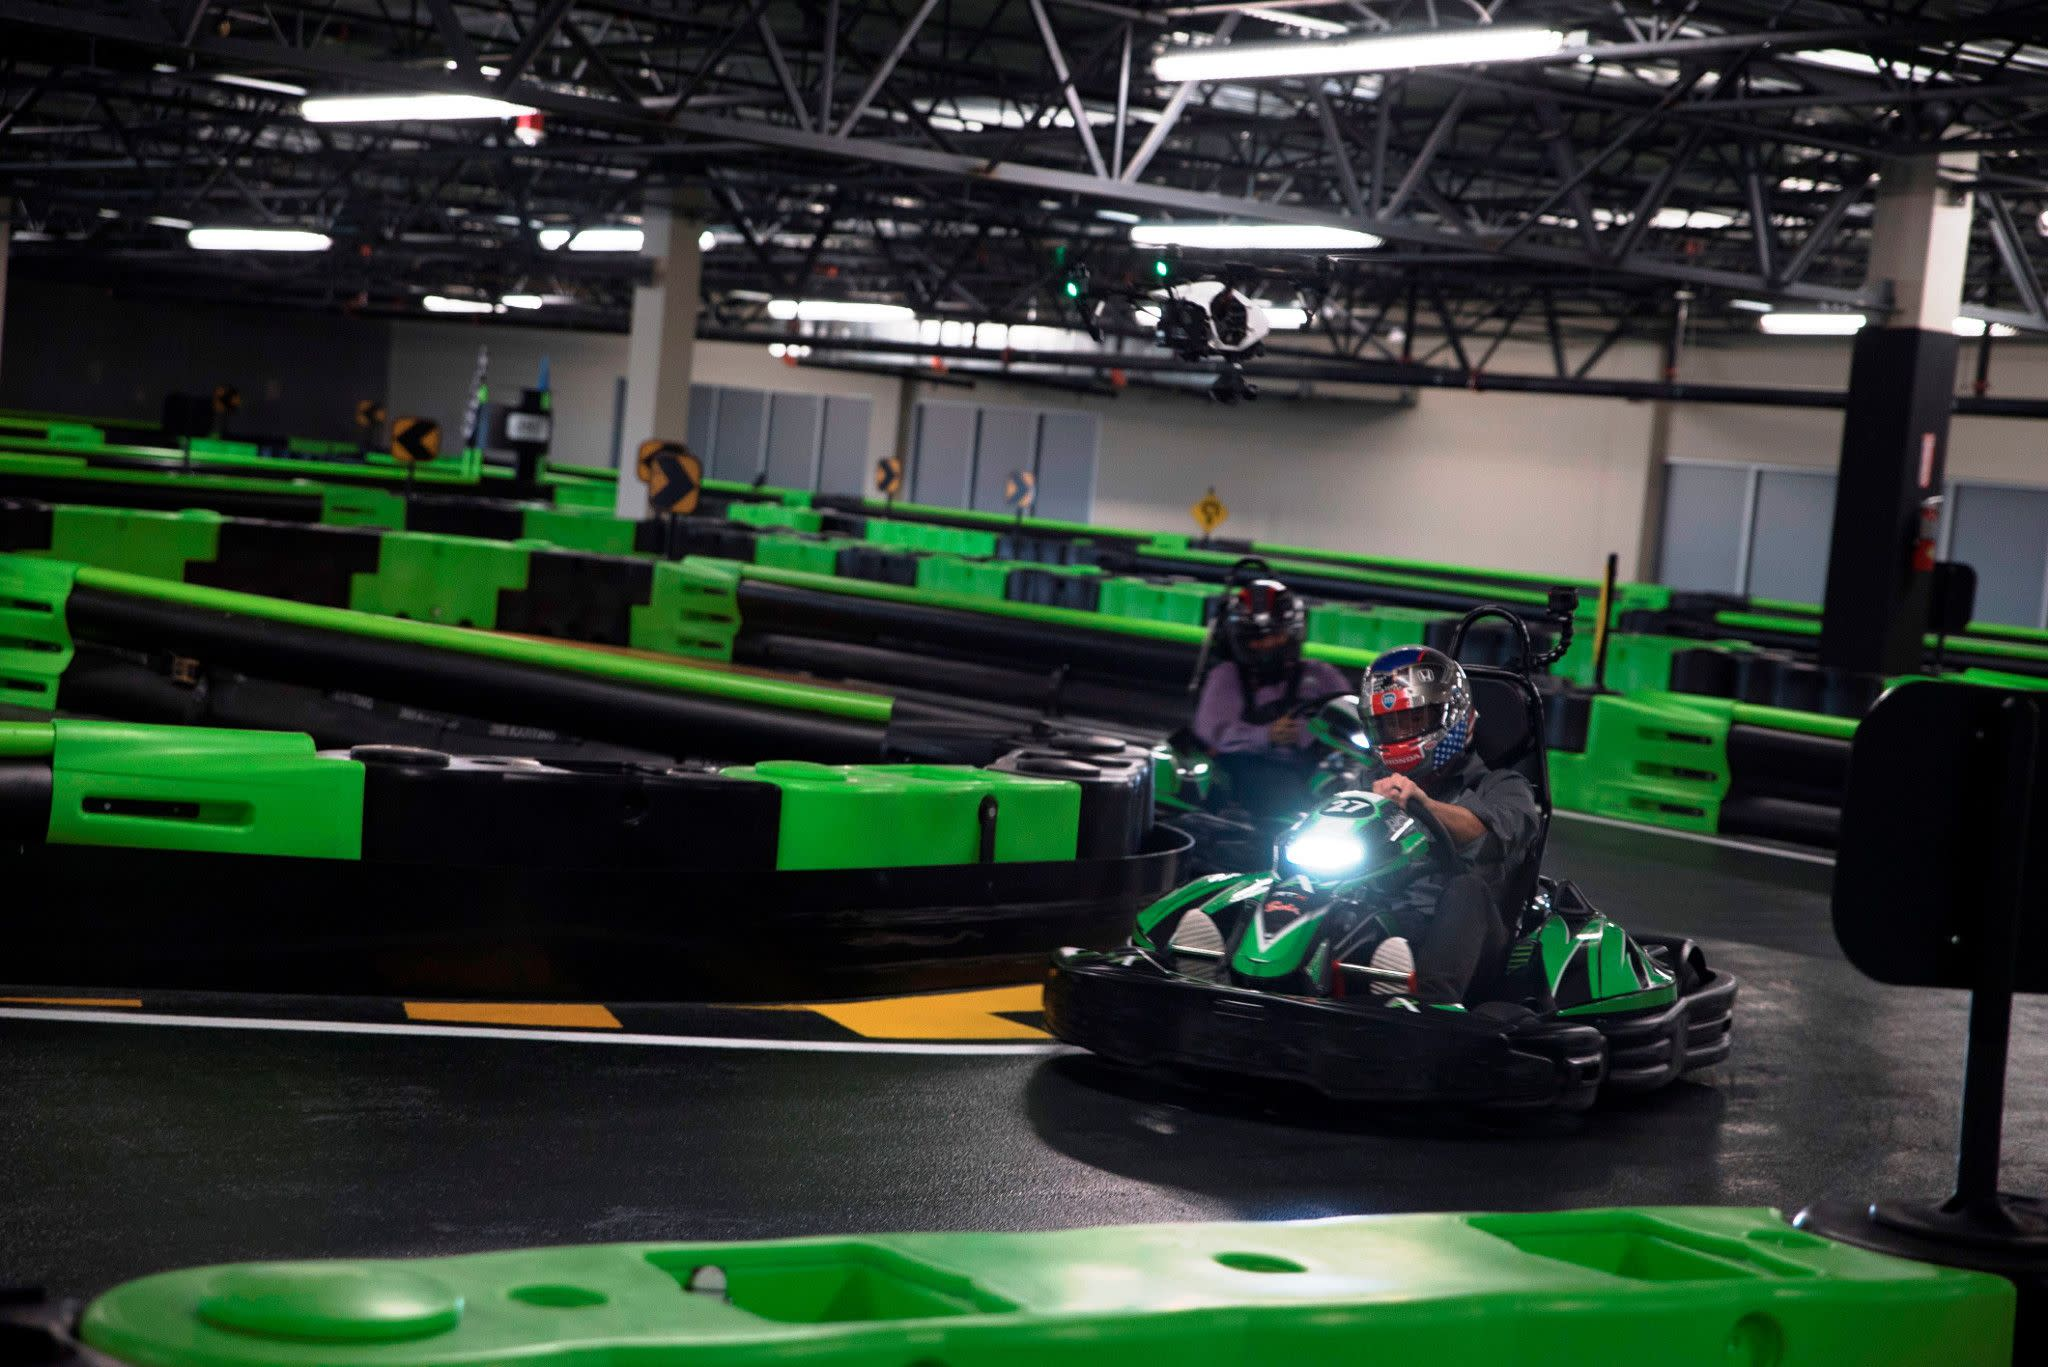 Andretti Indoor Karting & Games in Orlando